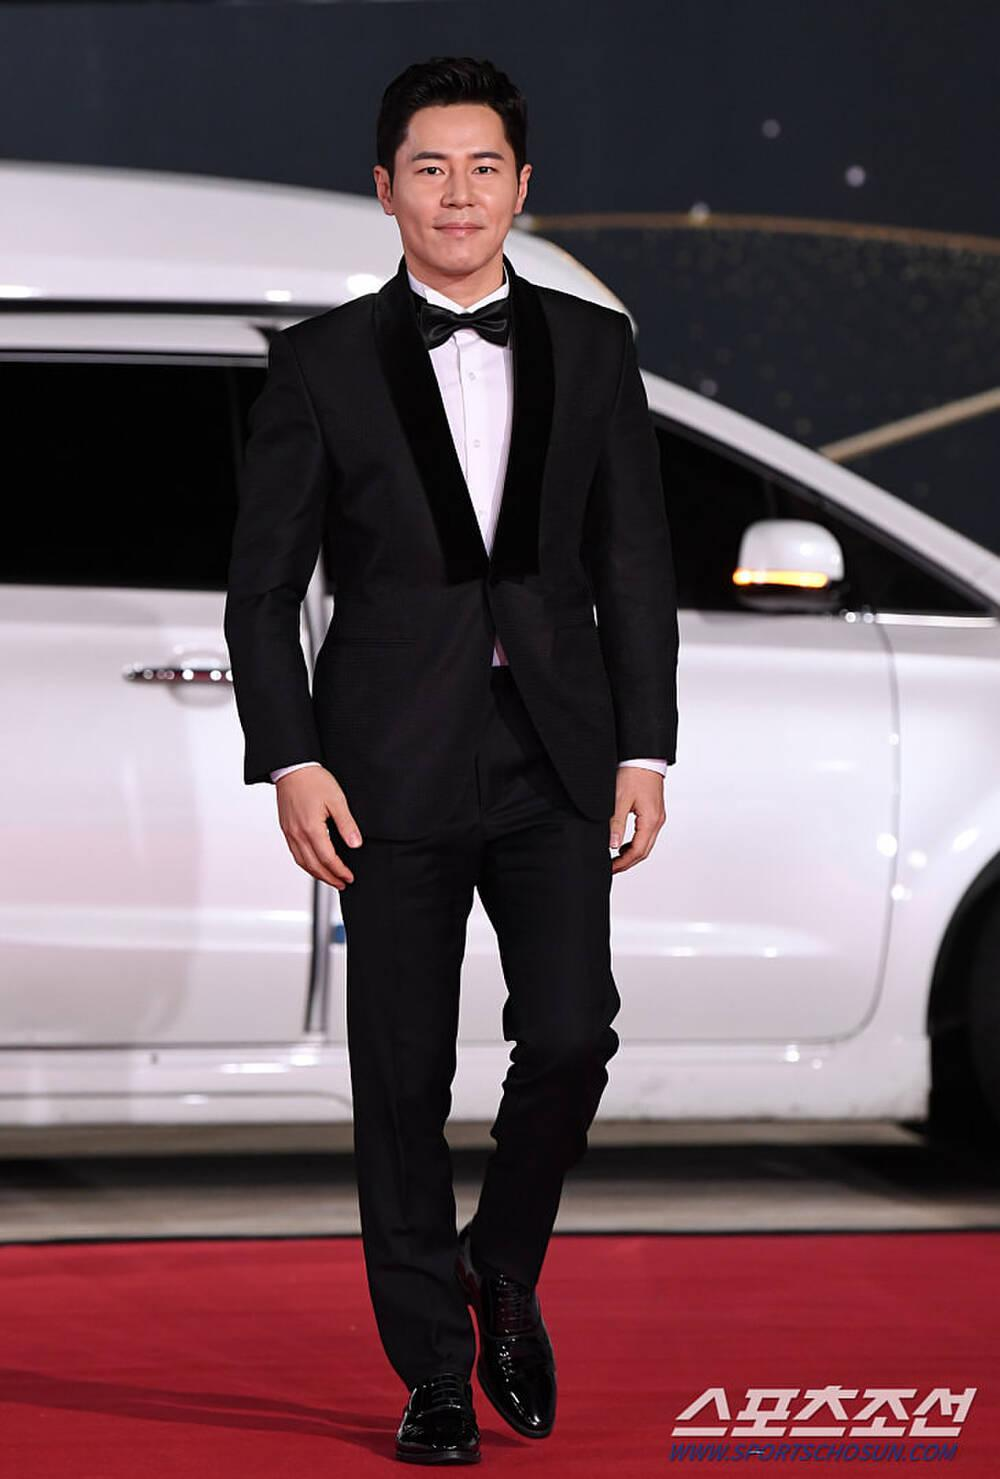 Thảm đỏ 'Rồng xanh 2020': Shin Hye Sun 'cân sắc' Shin Min Ah, Jung Woo Sung - Lee Byung Hun điển trai! Ảnh 39